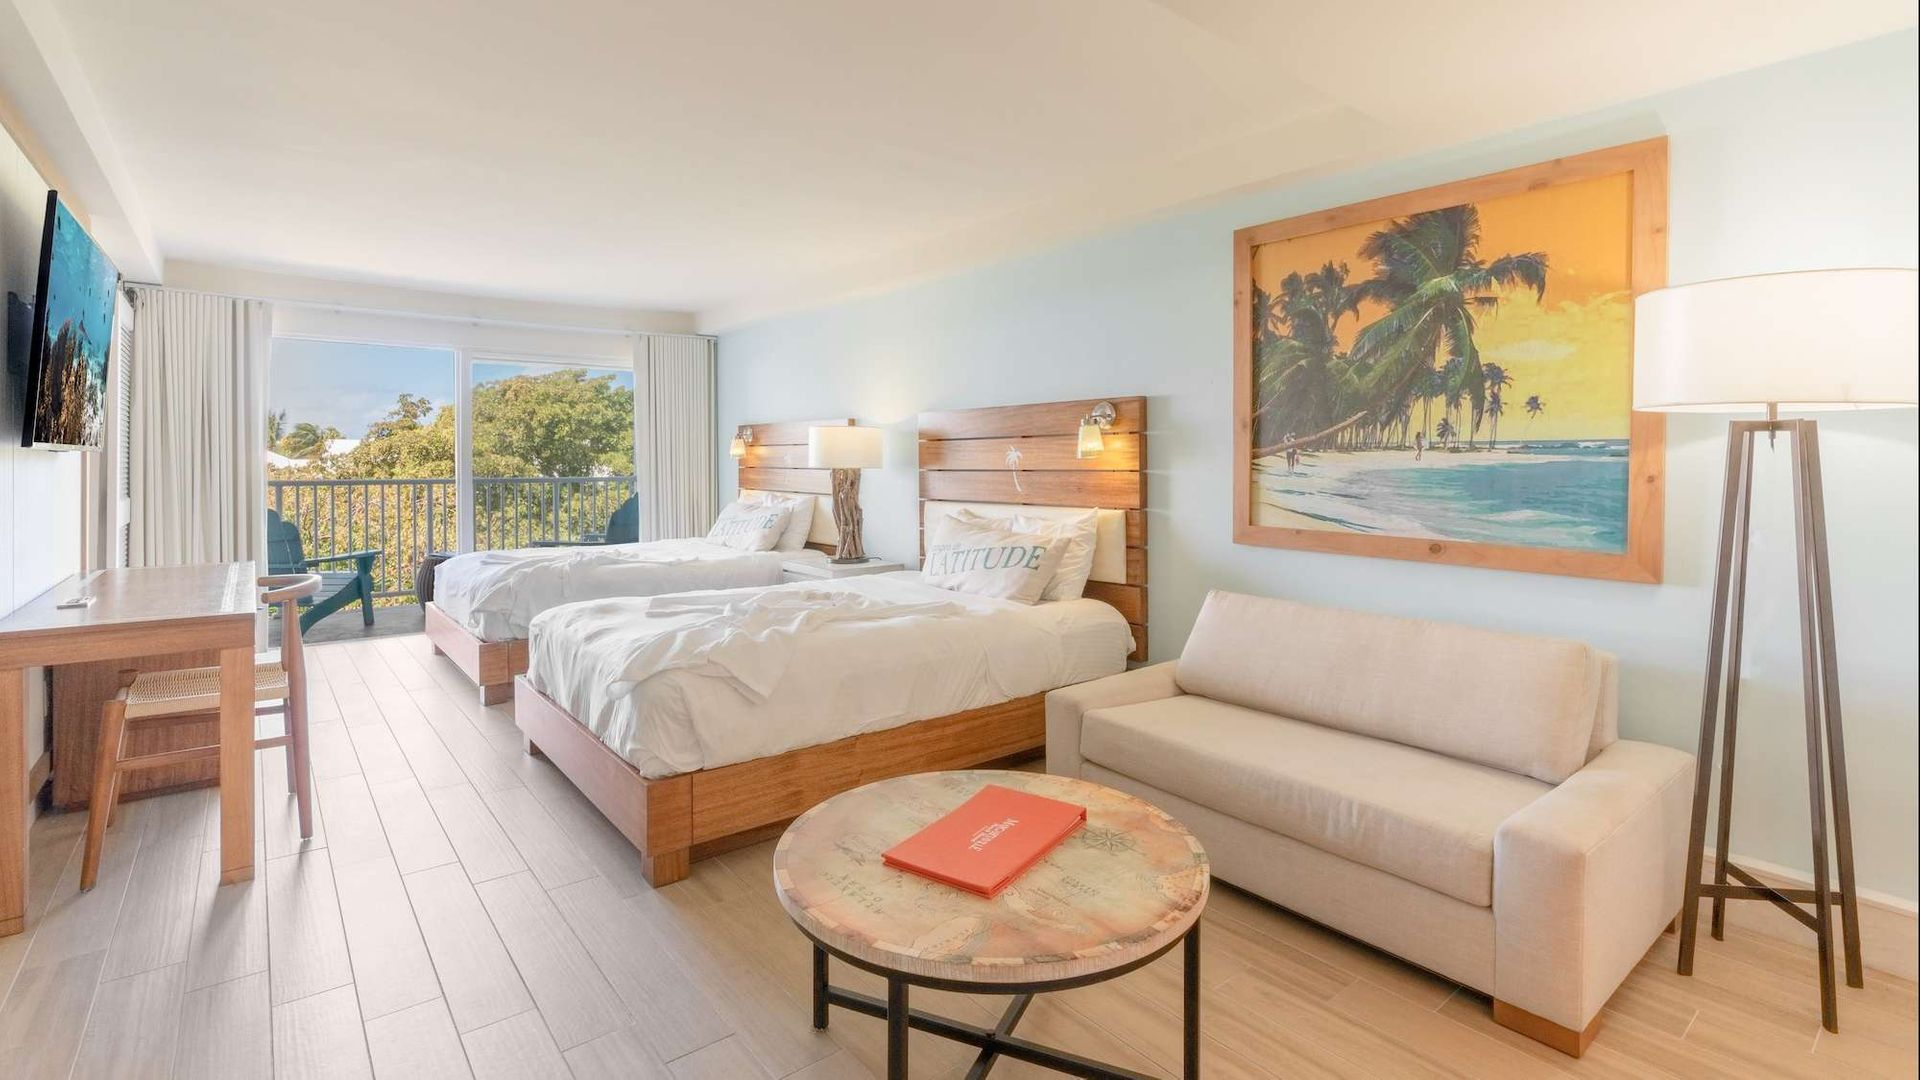 Margaritaville ( former name ) Ocean View – Extended Suite